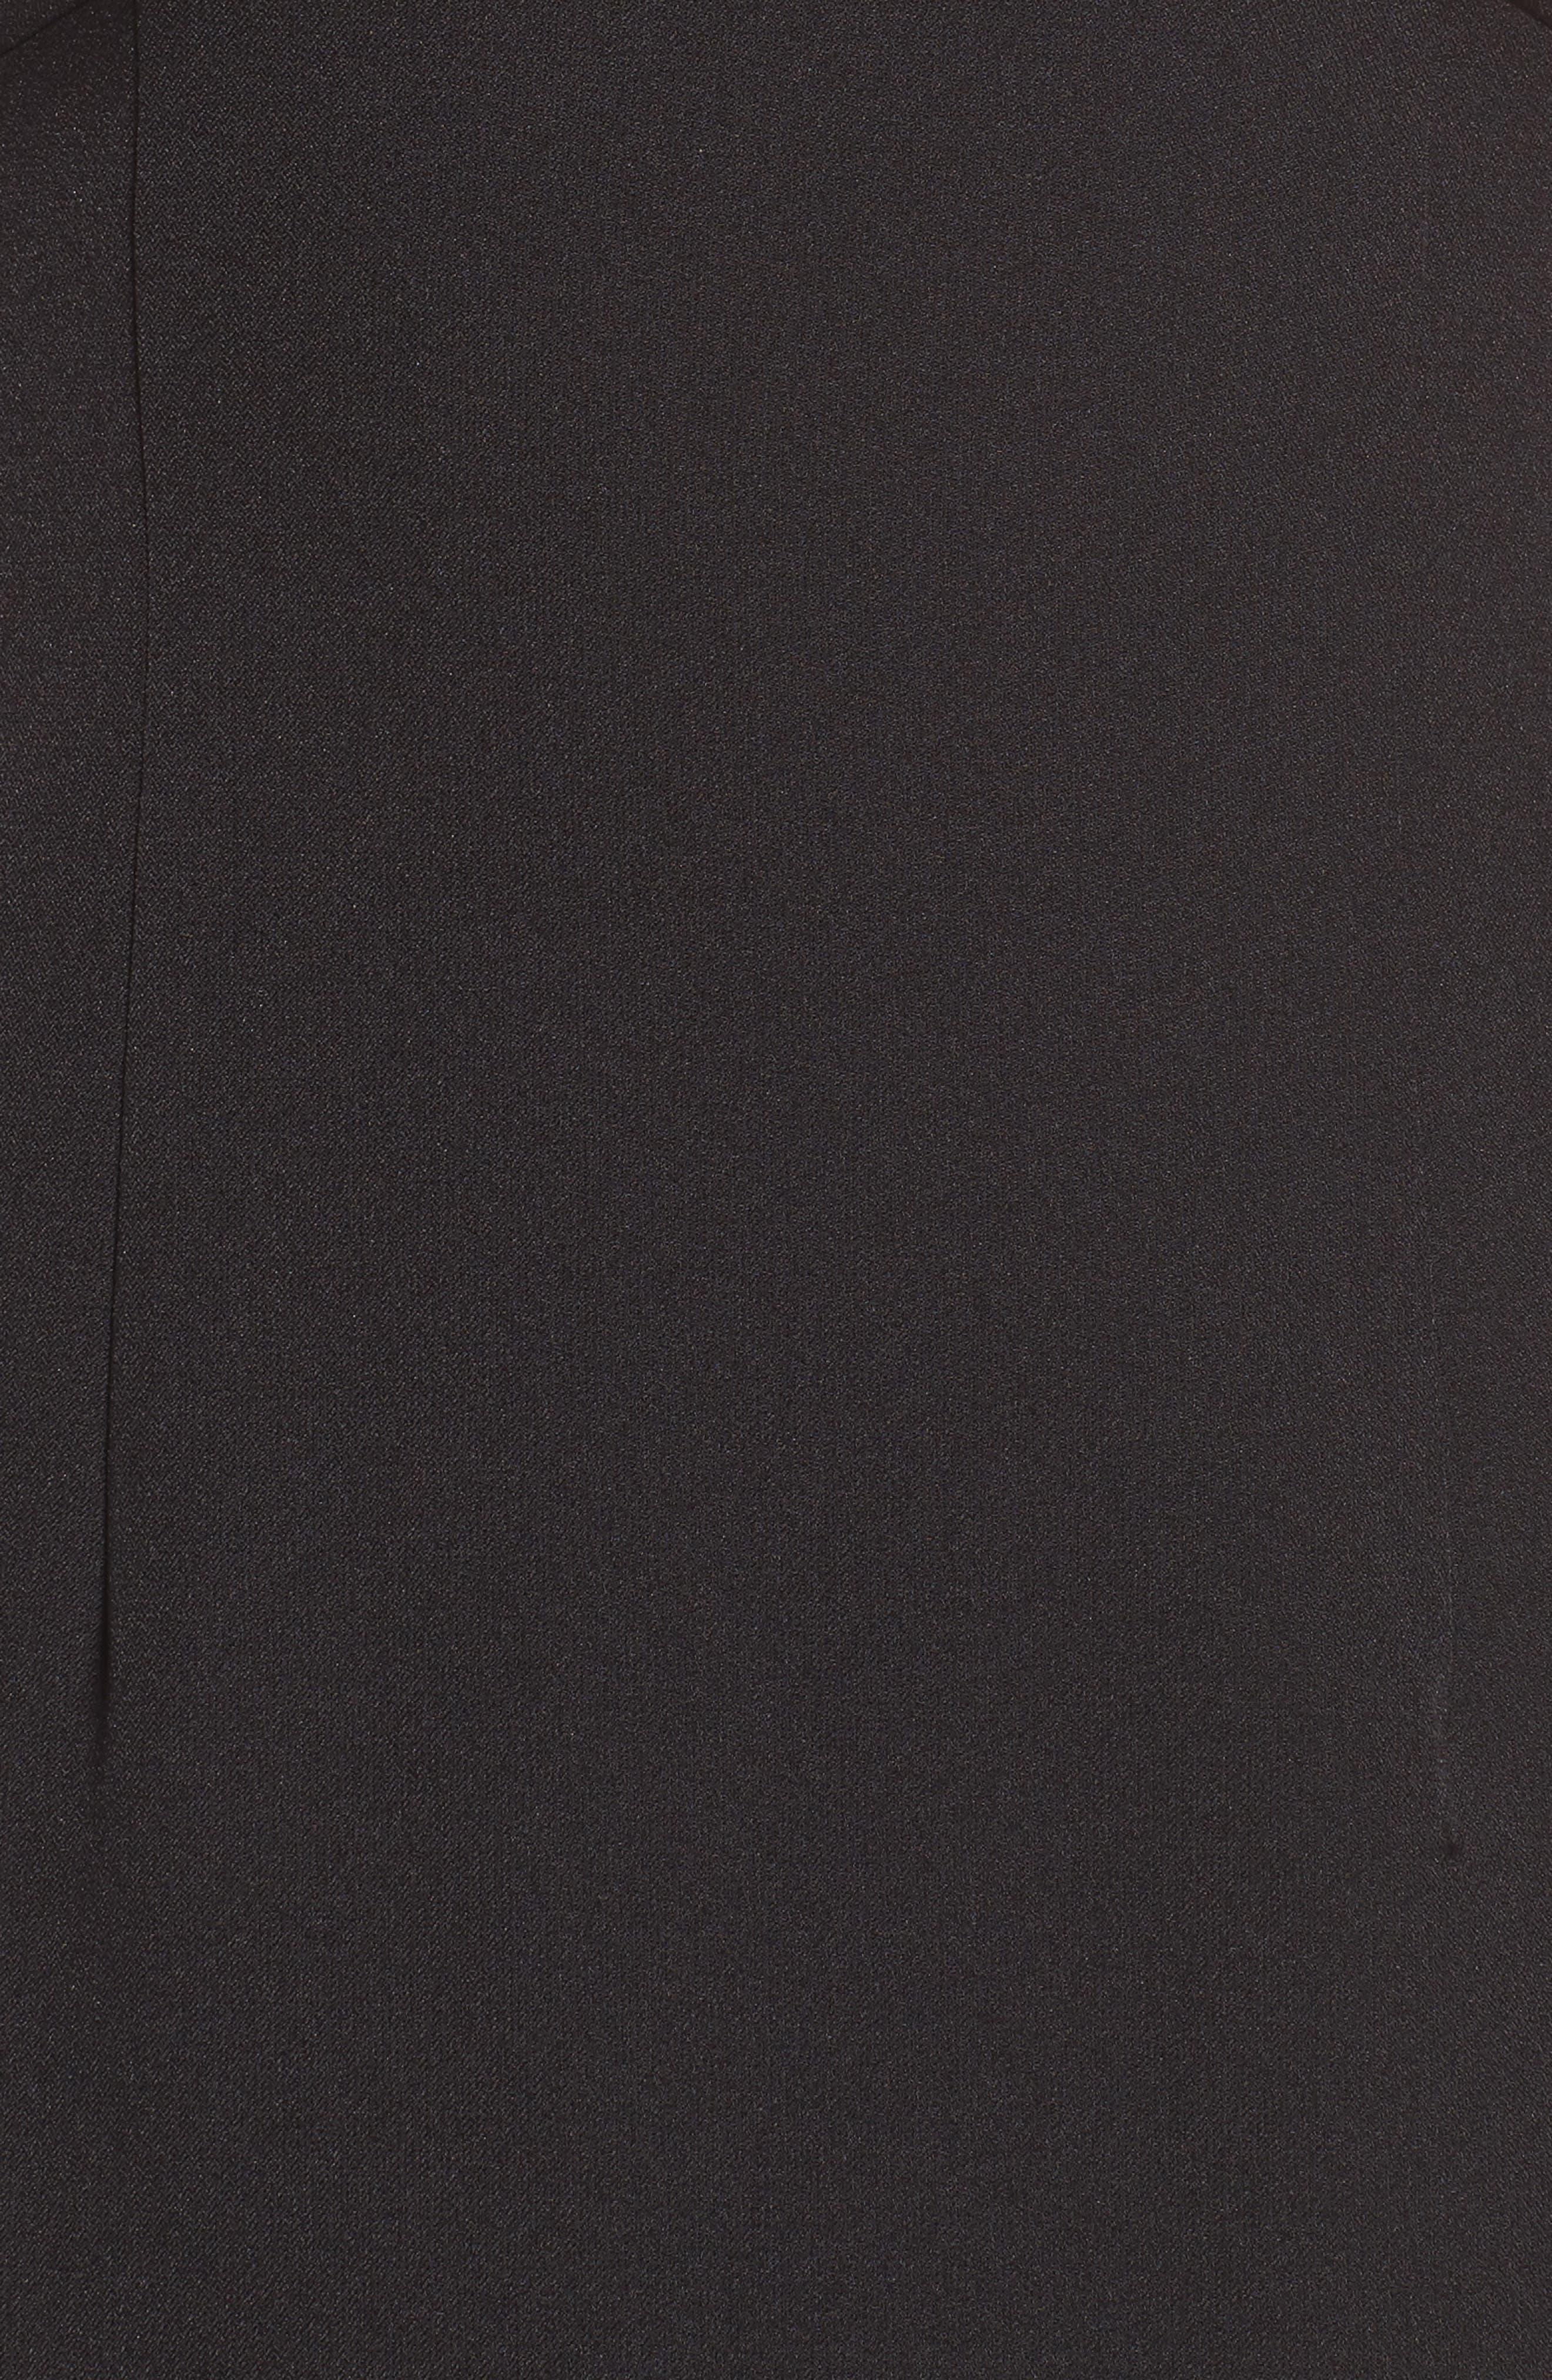 ADRIANNA PAPELL,                             Scalloped Crepe Sheath Dress,                             Alternate thumbnail 6, color,                             001